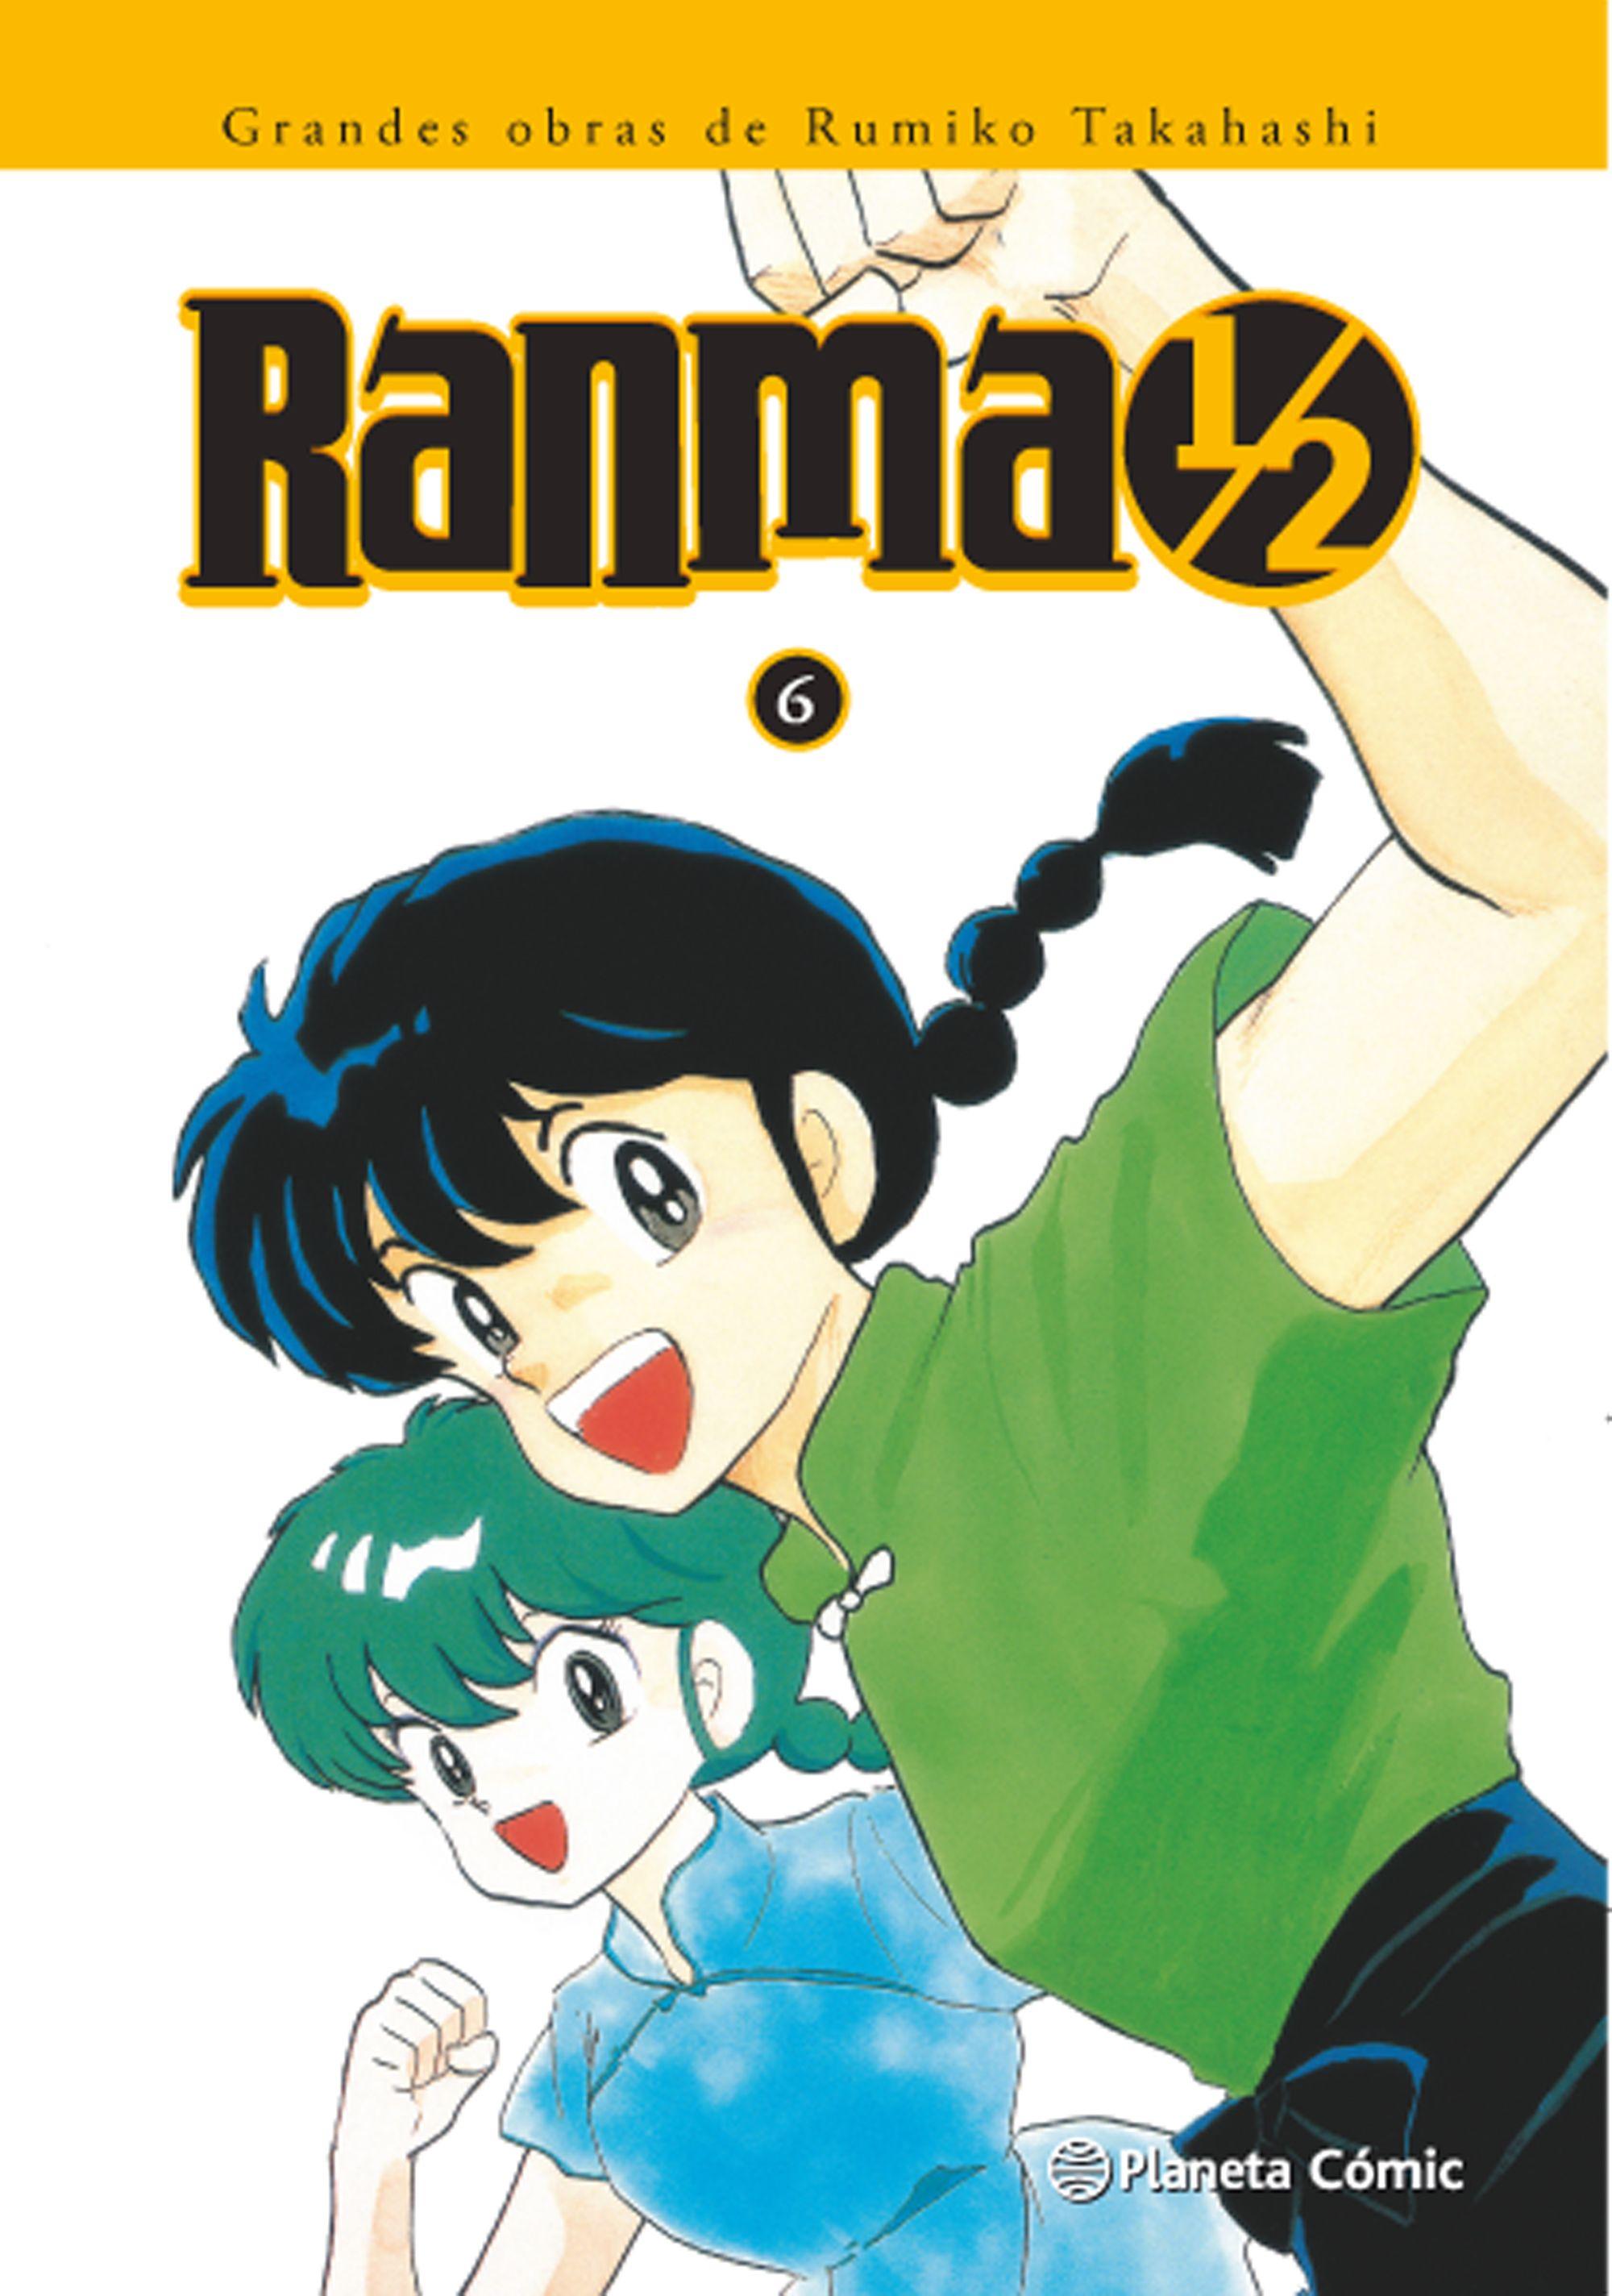 Ranma 1/2 Kanzenban. Tomo 6 - Rumiko Takahashi - Planeta Deagostini Cómics